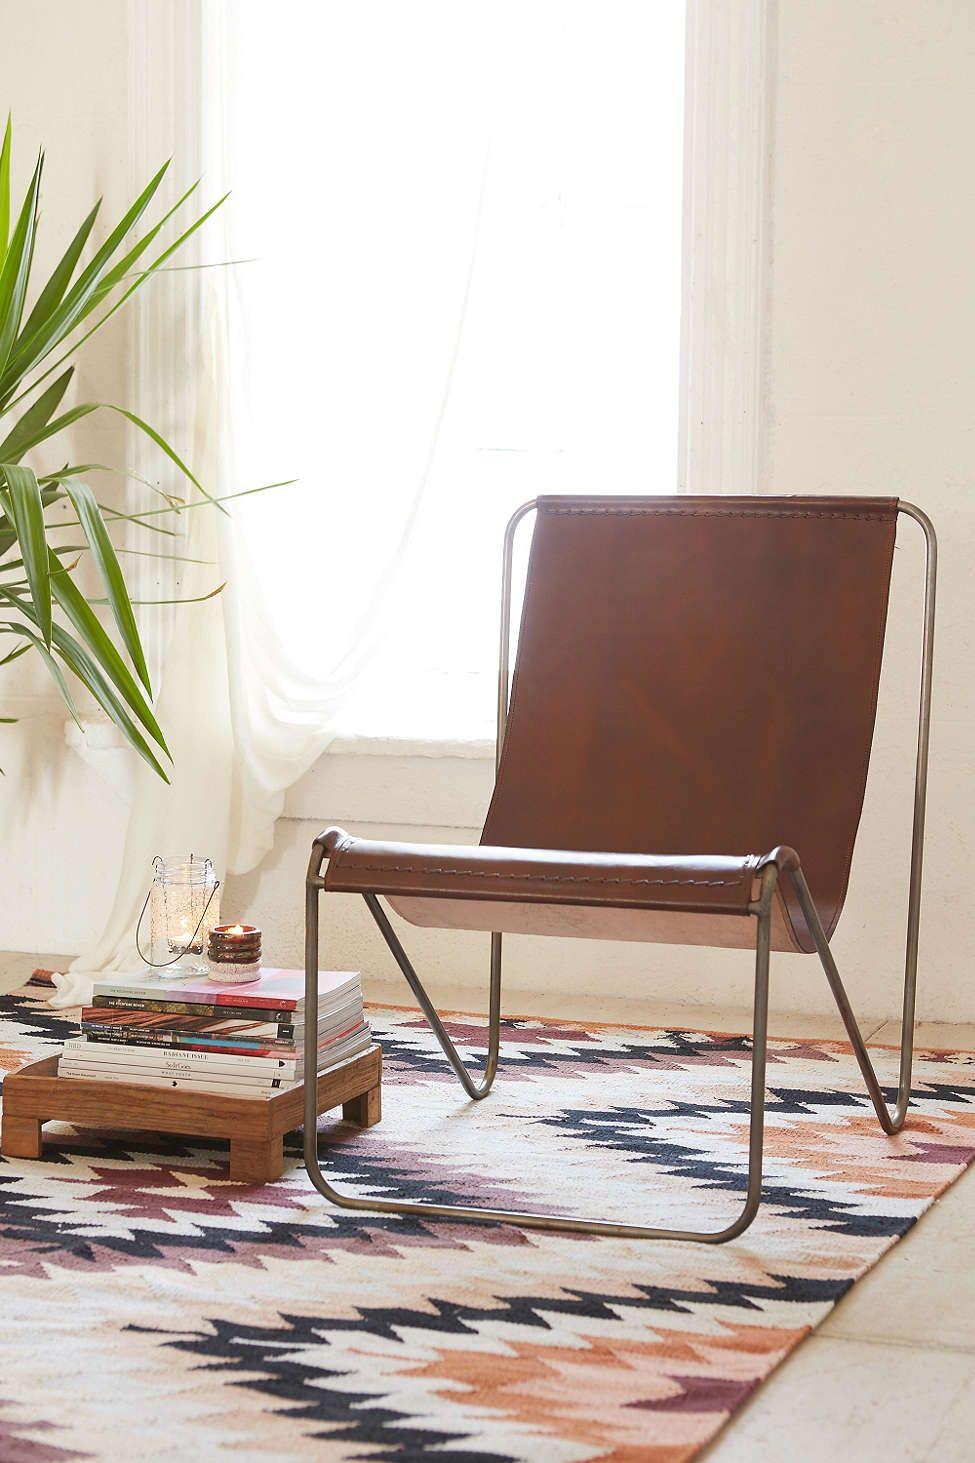 Maddox Leather Sling Chair Mobilier De Salon Decoration Interieure Mobilier